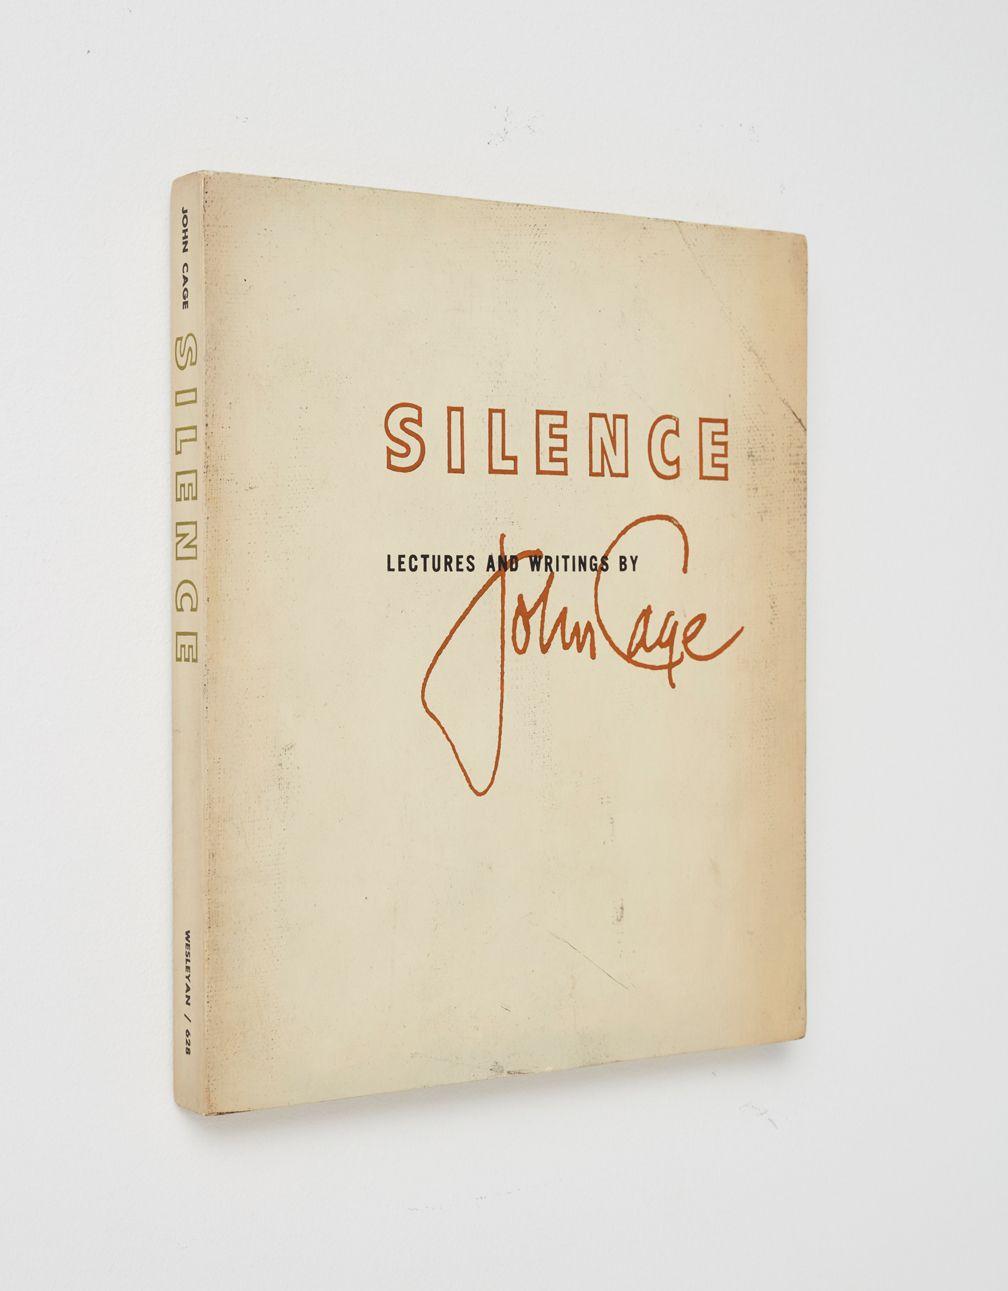 Steve Wolfe, Untitled (Silence), 1991